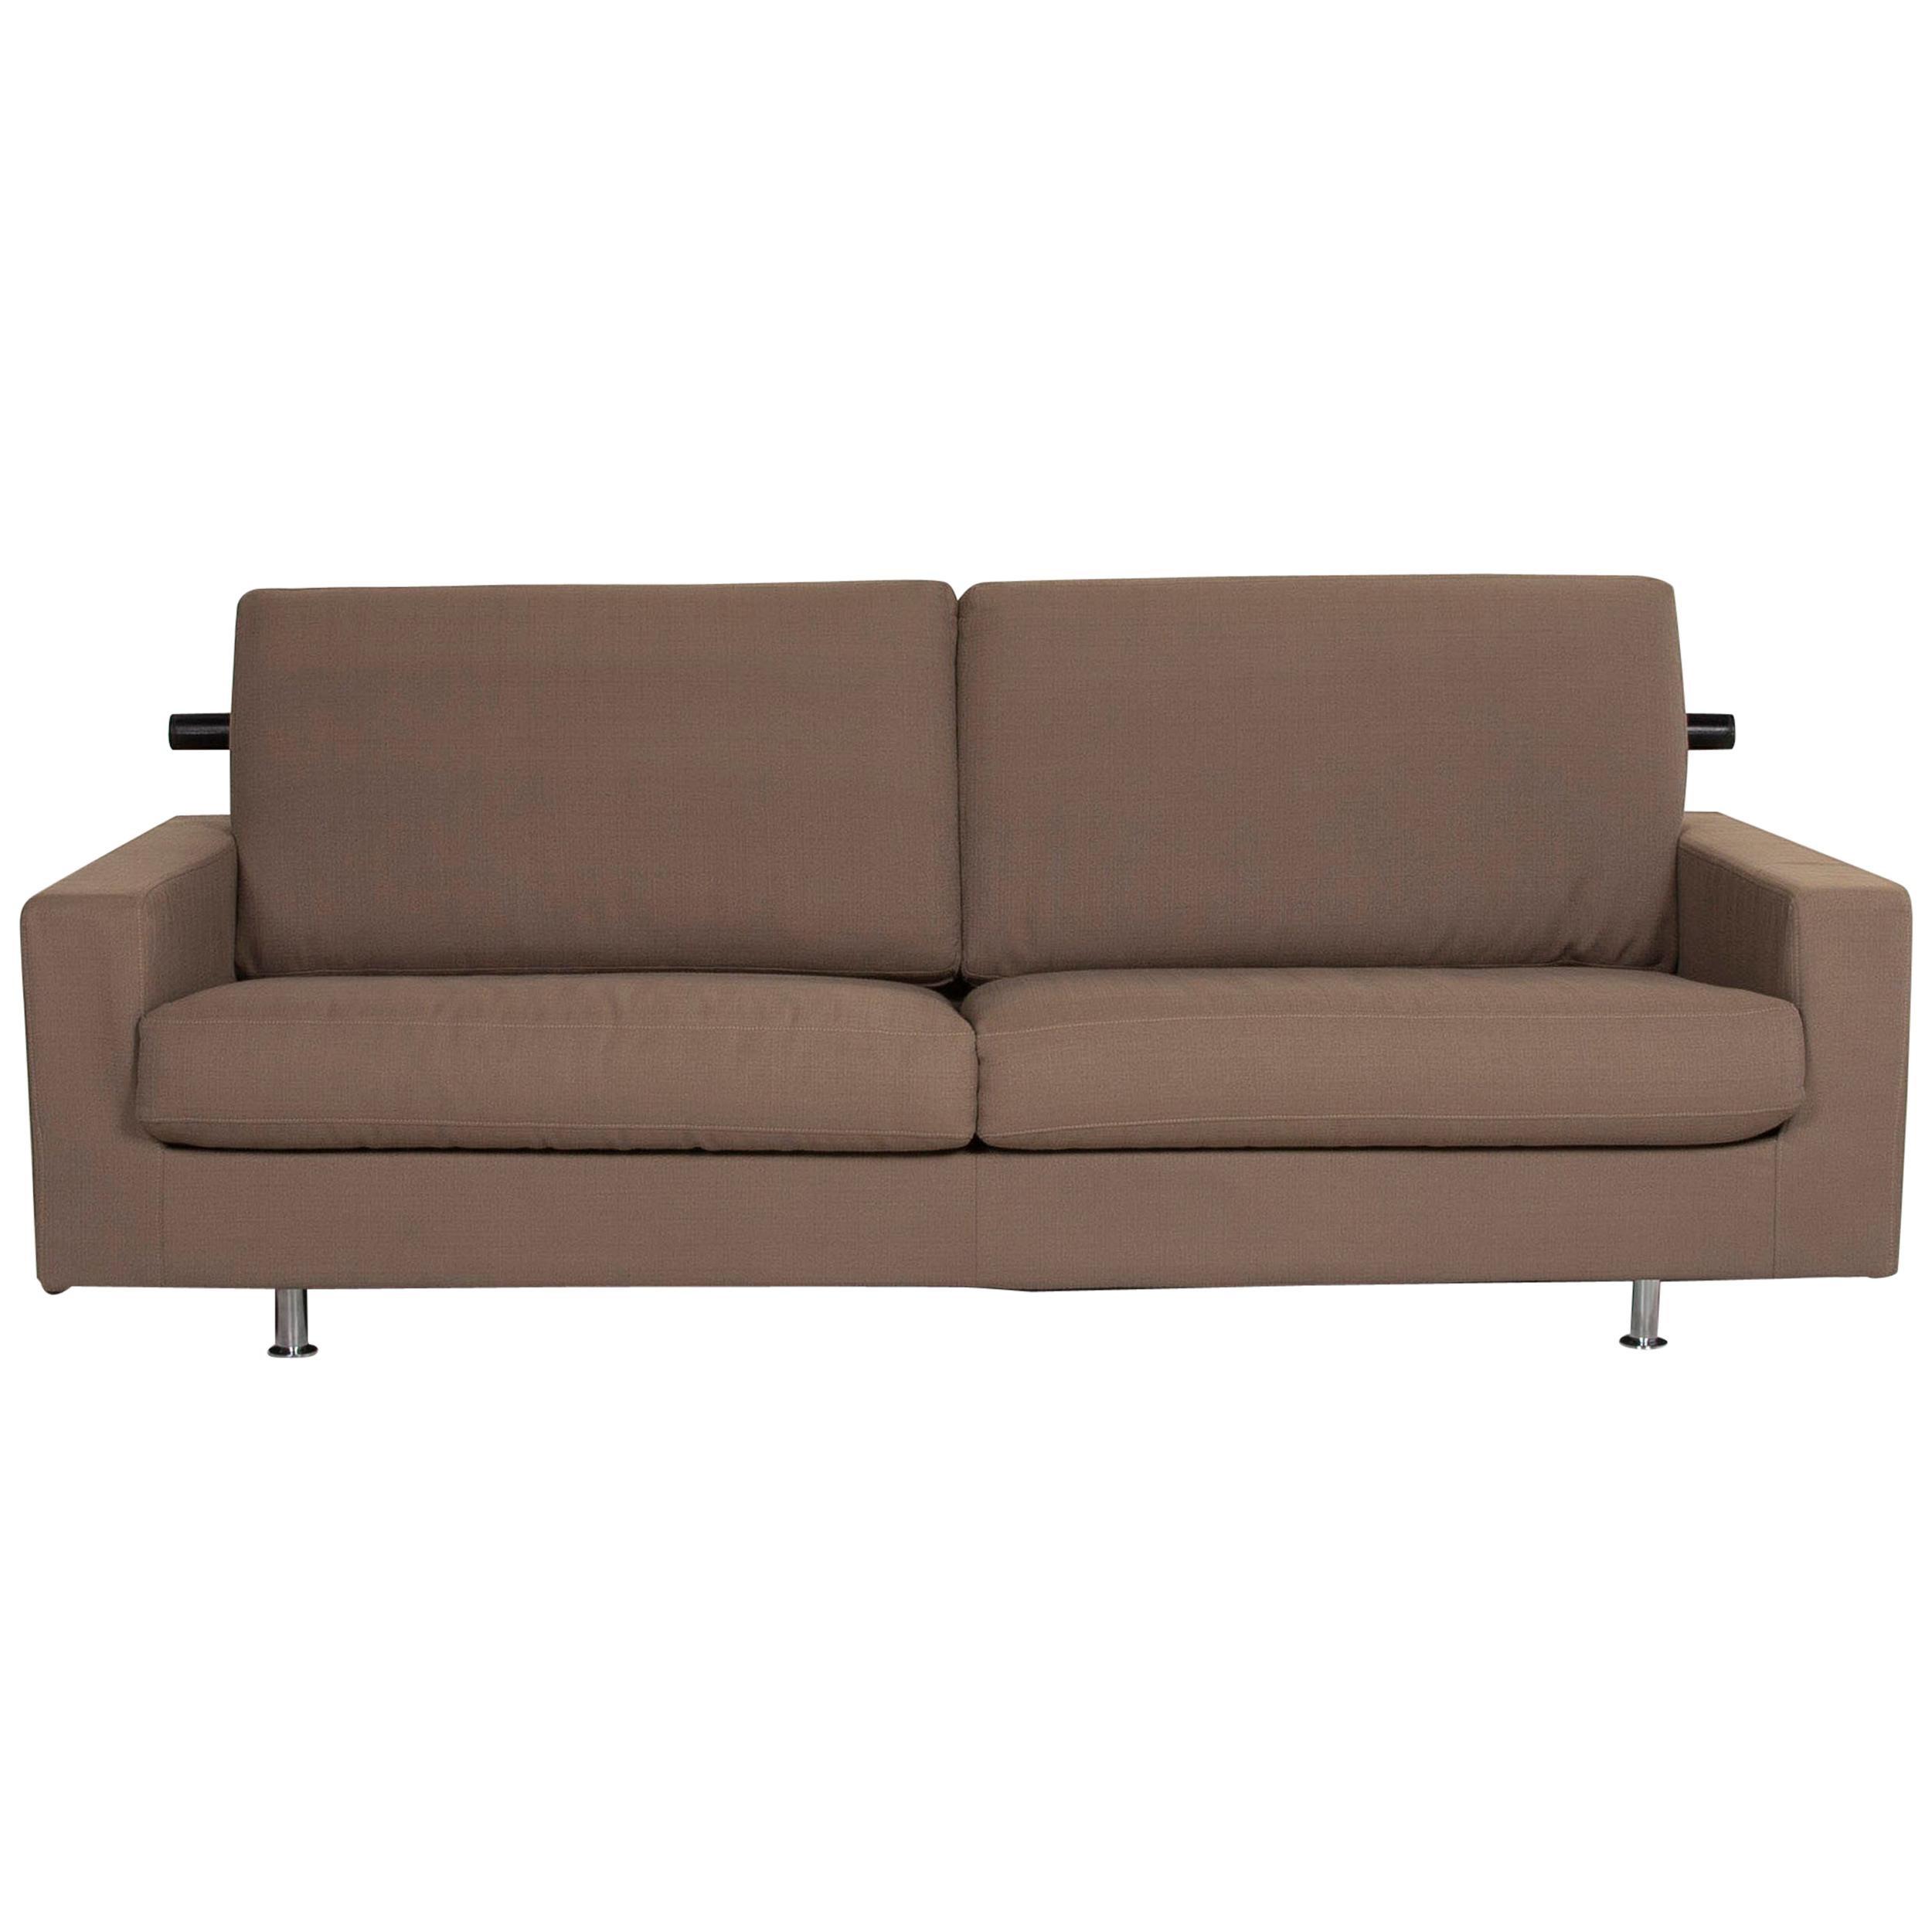 Flexform Fabric Sofa Beige Two-Seat